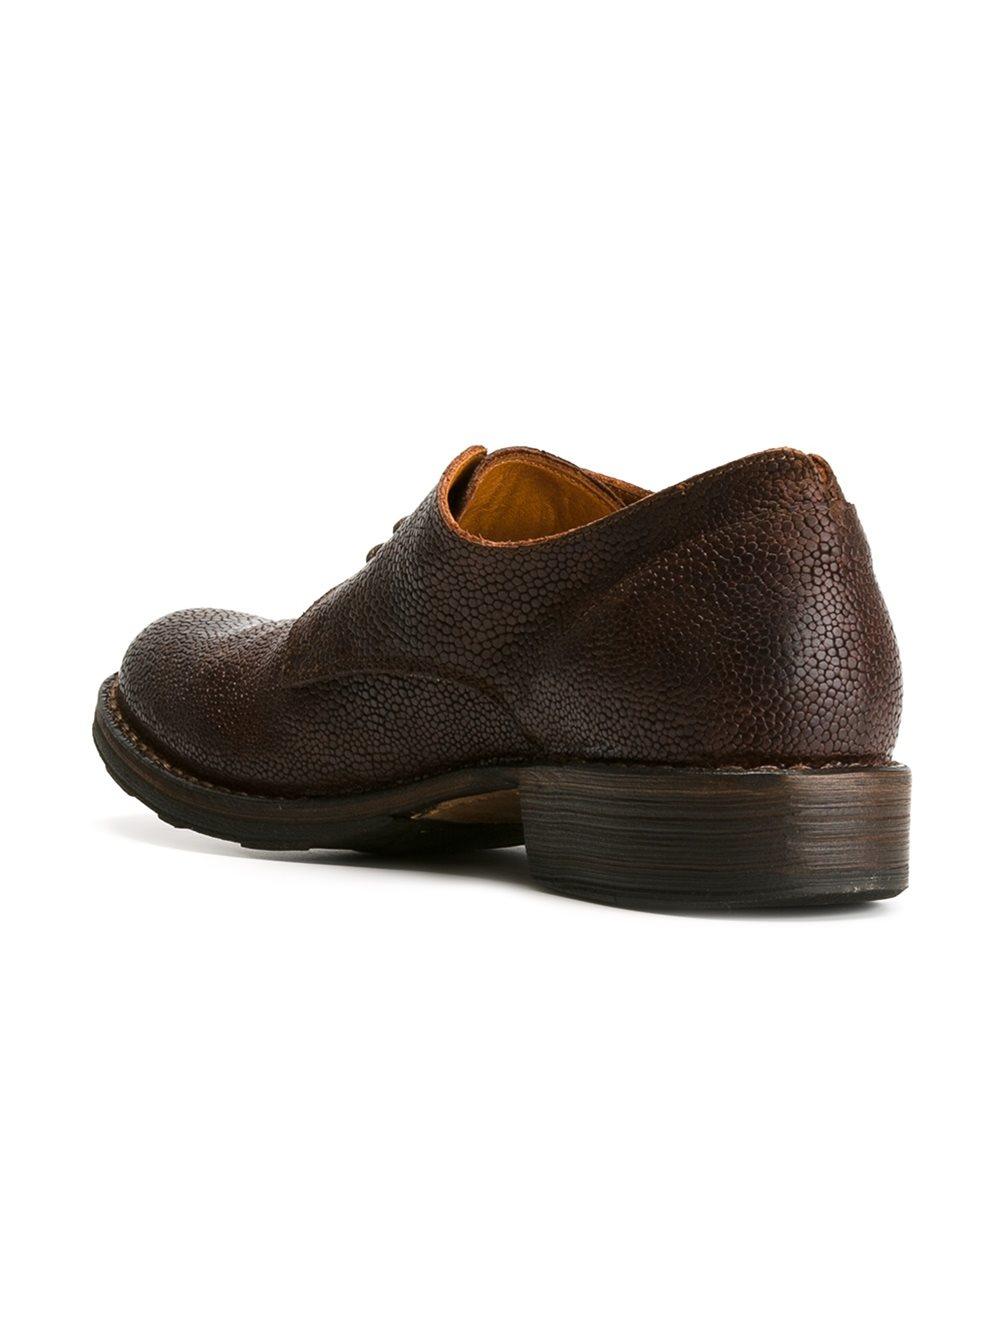 fiorentini baker 39 eternity 39 derby shoes in brown for men. Black Bedroom Furniture Sets. Home Design Ideas